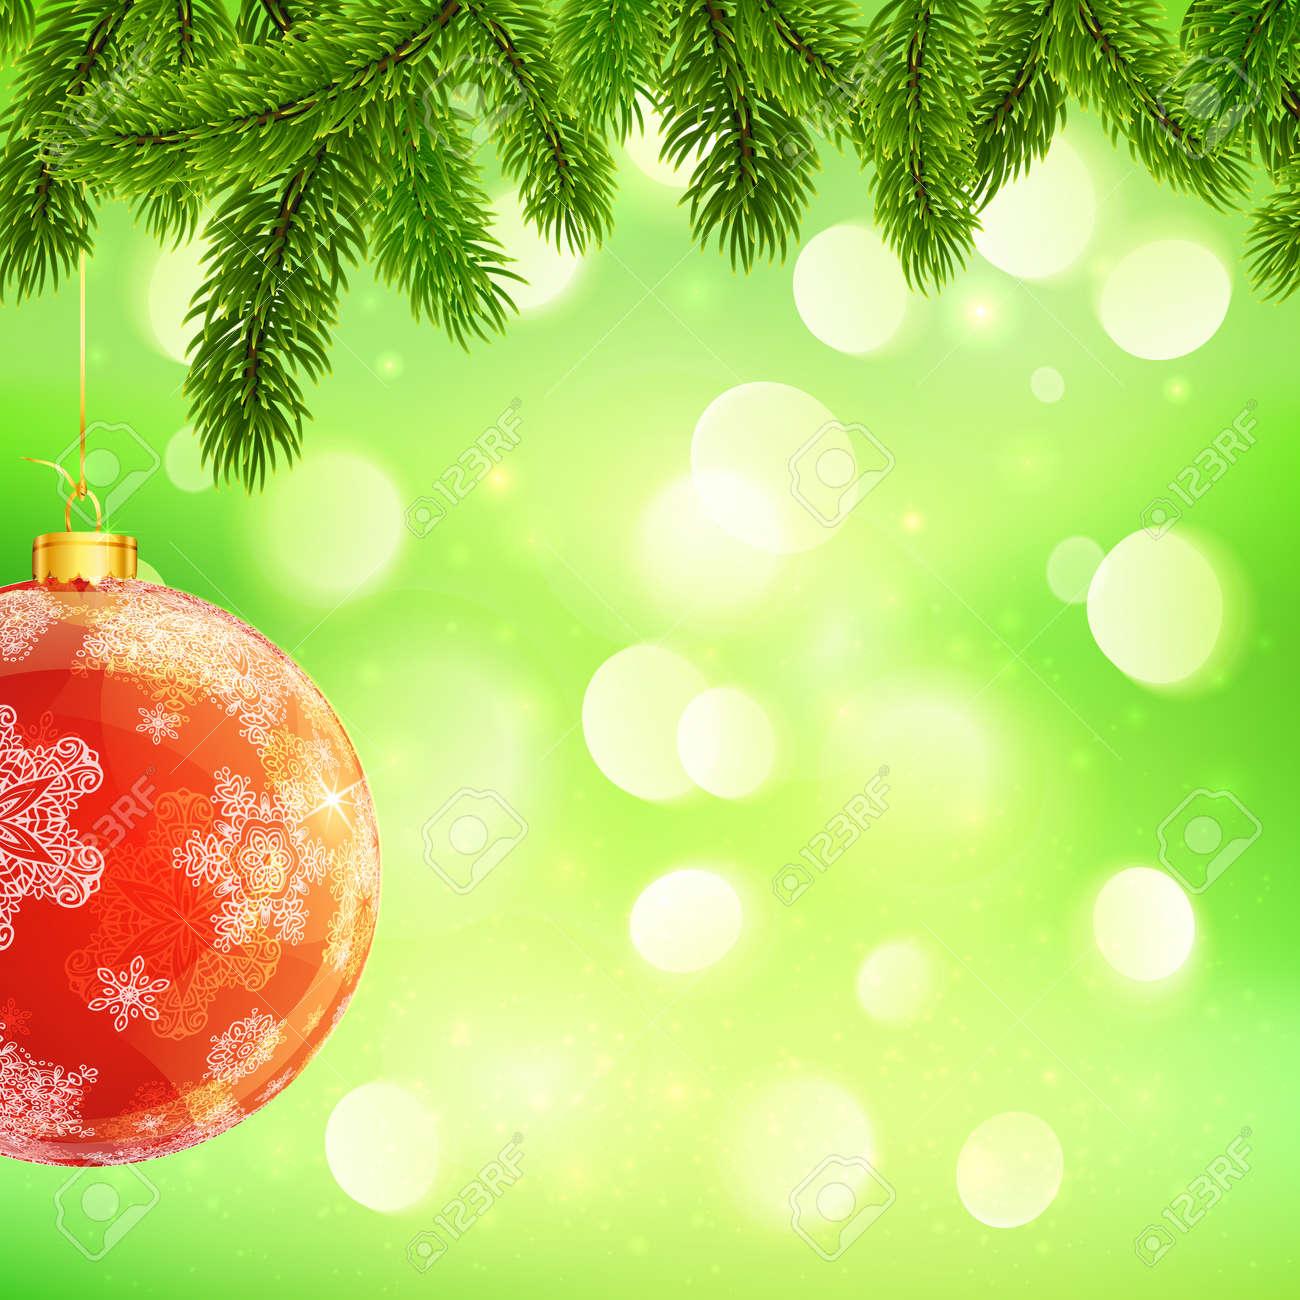 christmas template hanging red ball and fir tree branches christmas template hanging red ball and fir tree branches on green bokeh light background stock